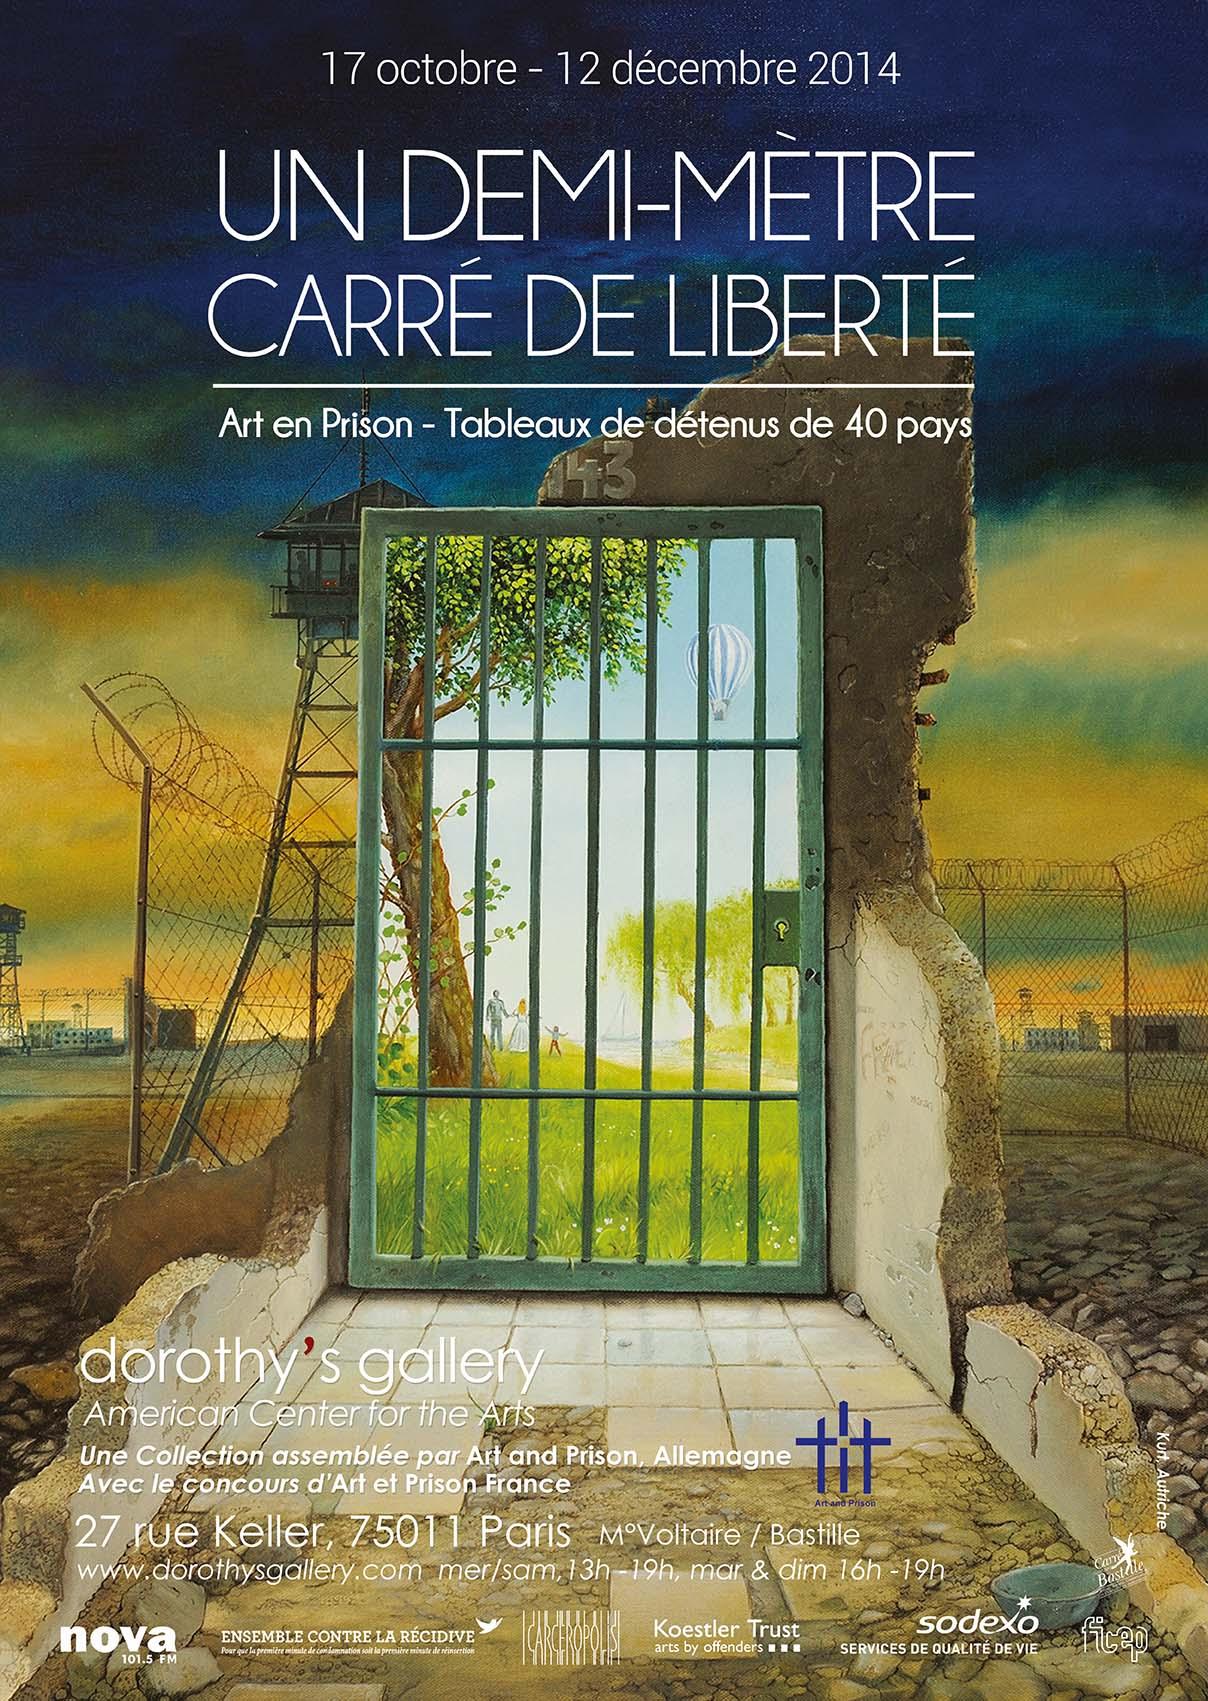 Art and Prison